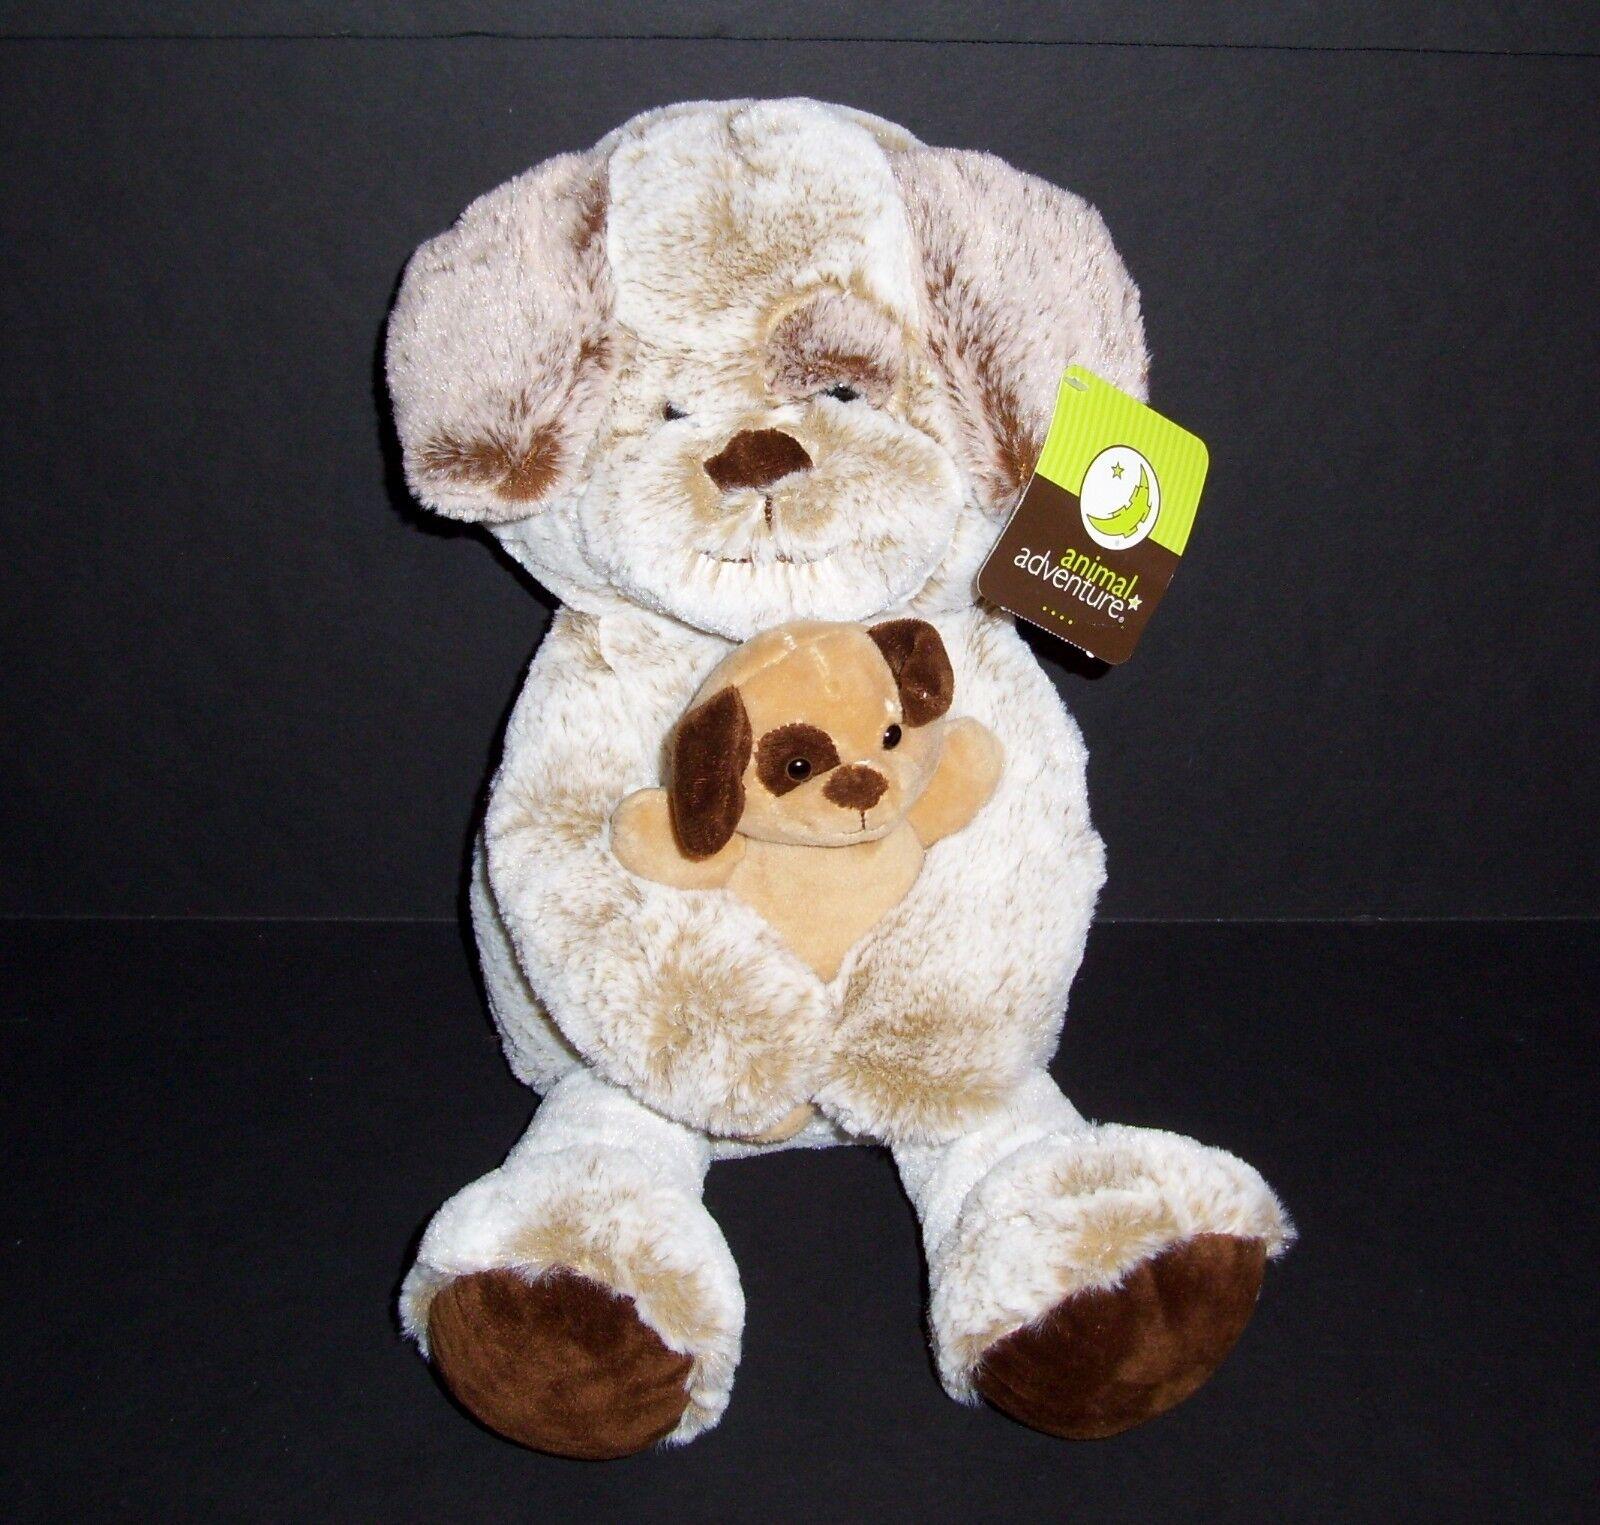 17  NEW Animal Adventure Tan Brown Puppy Dog Plush Holding Baby 2018 Stuffed Toy